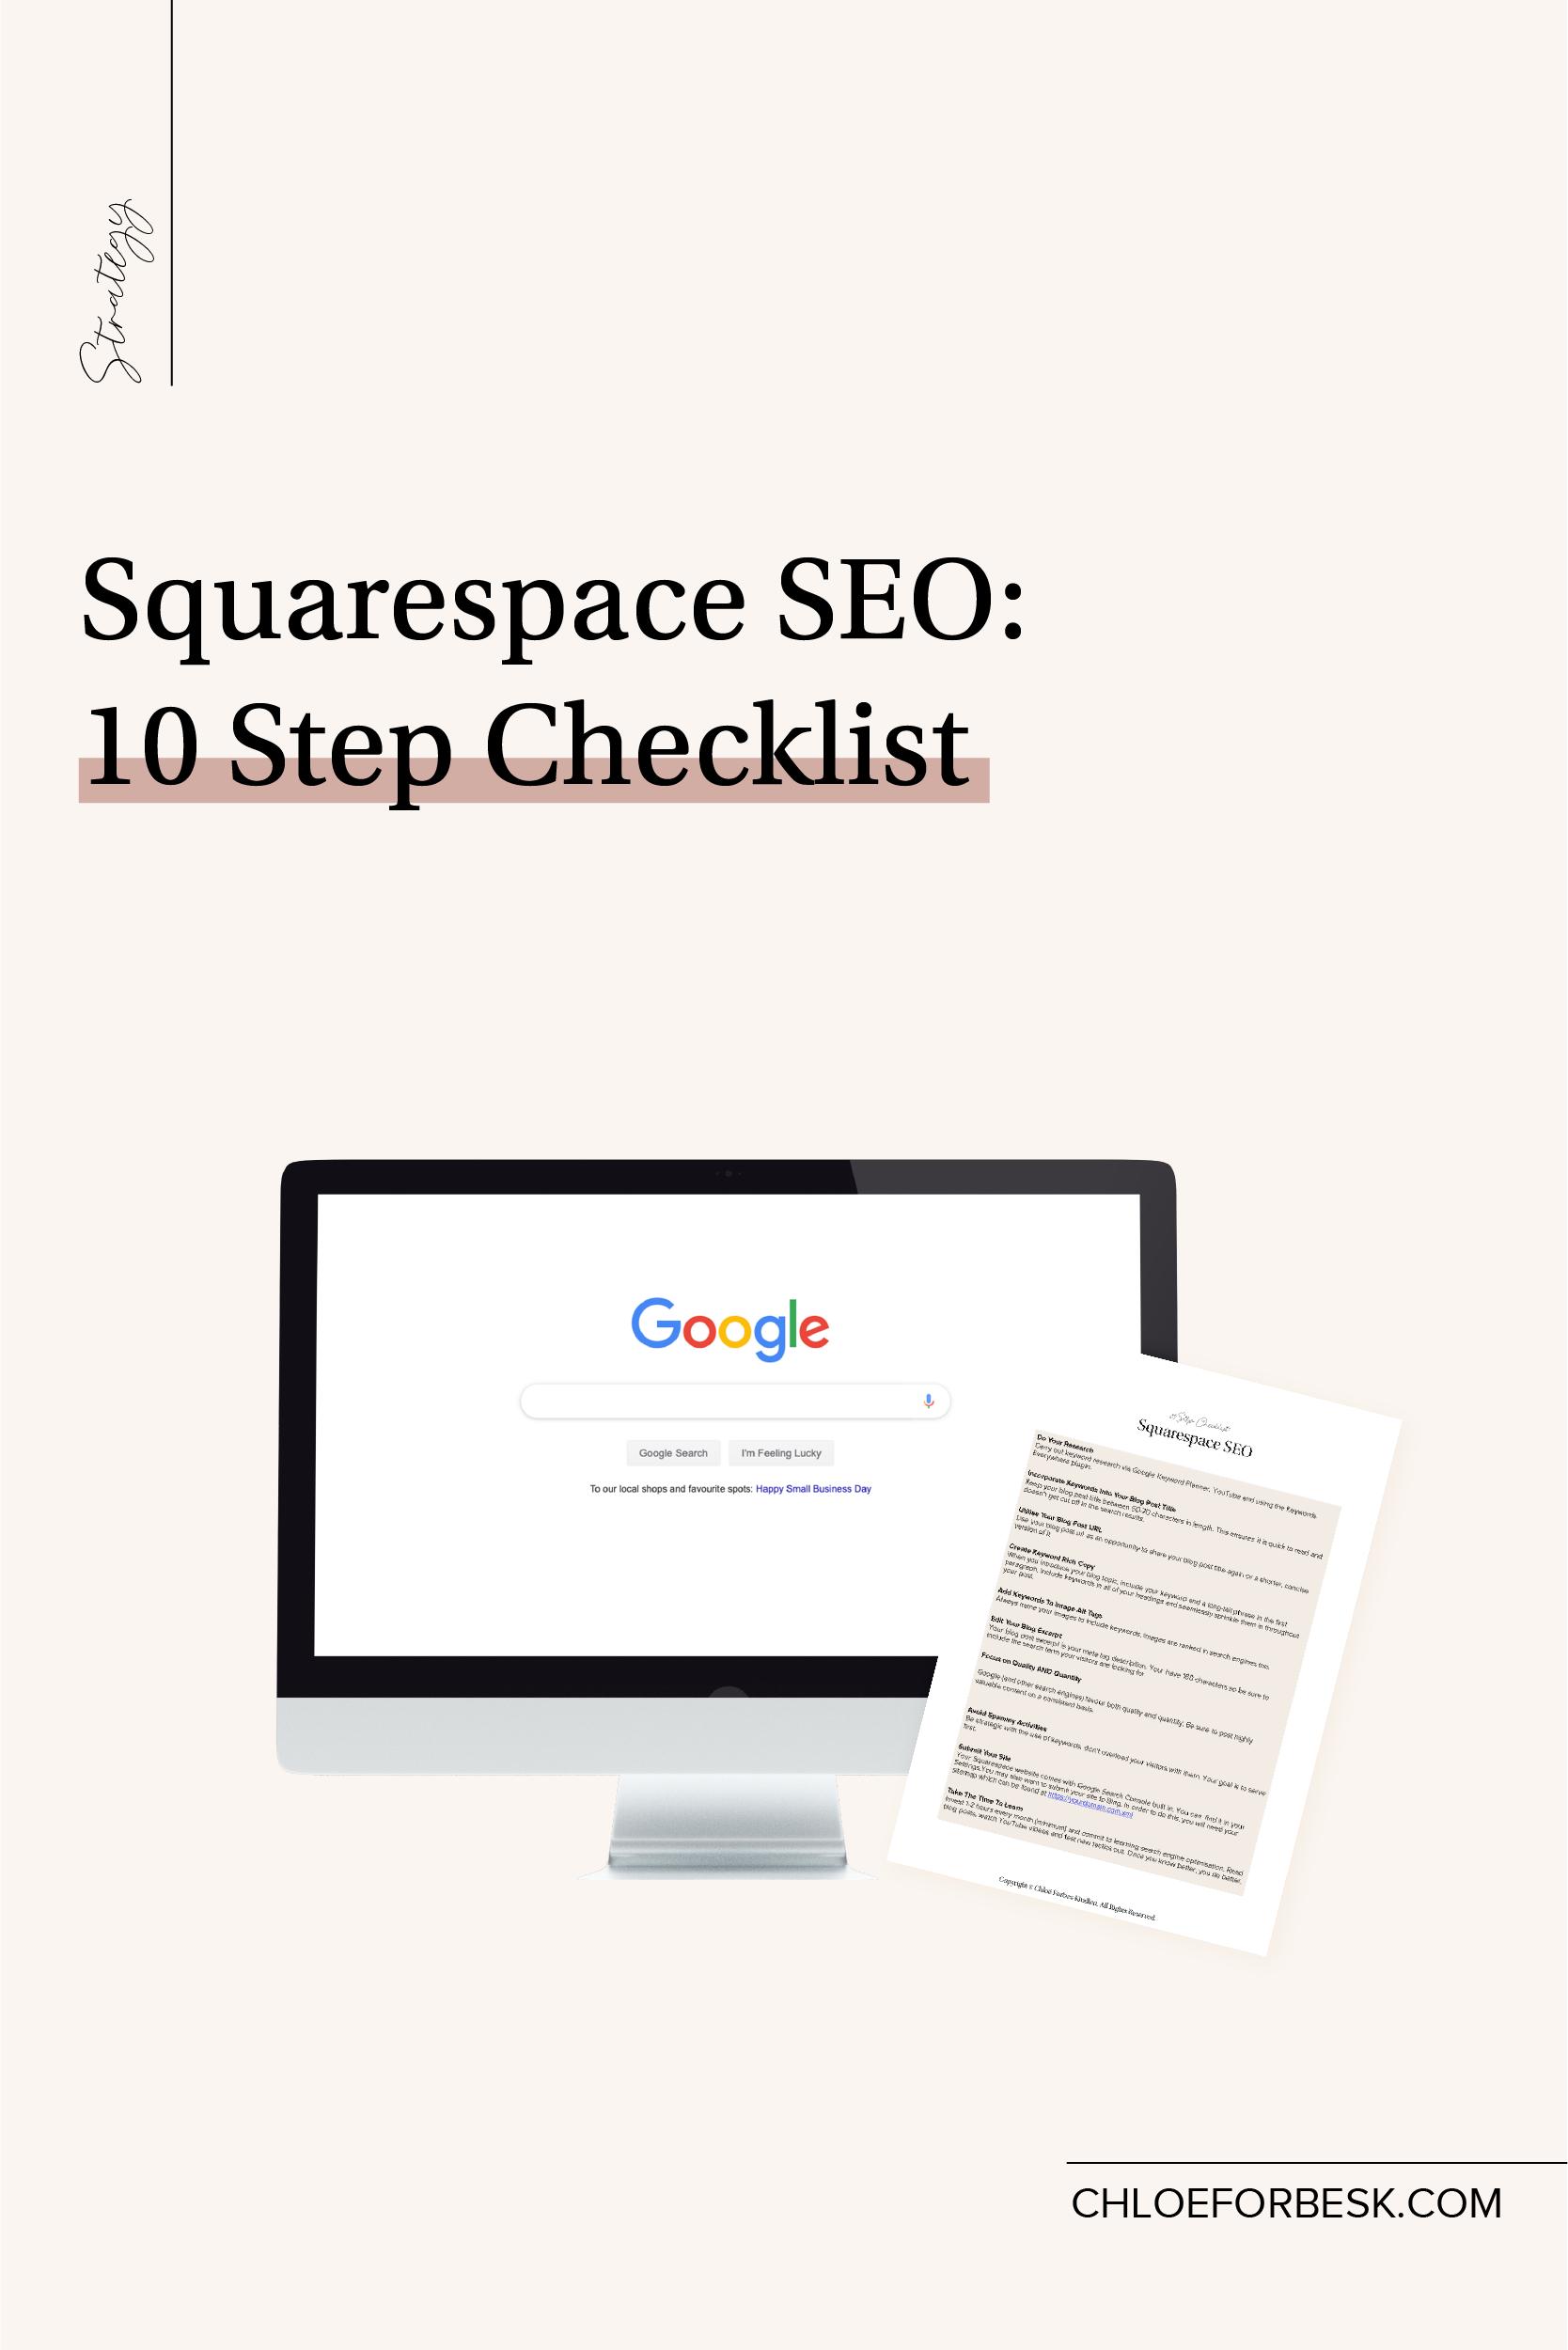 Squarespace SEO- 10 Step Checklist-02.png